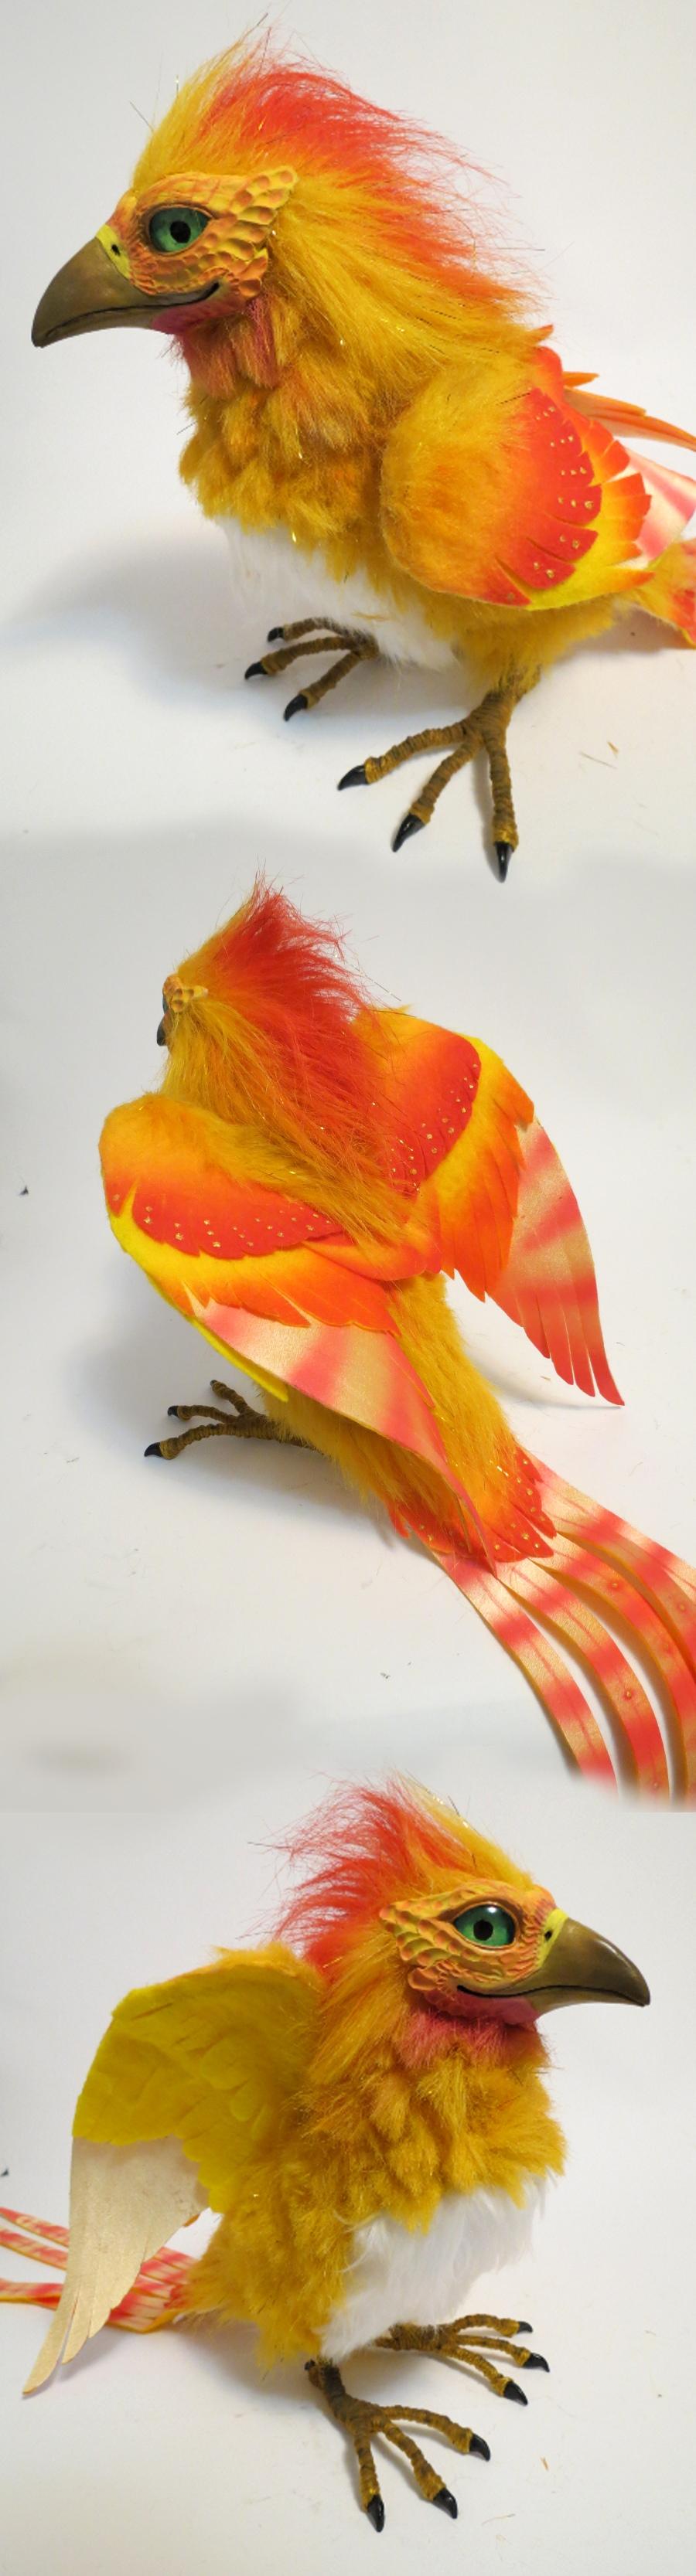 Phoenix by kimrhodes